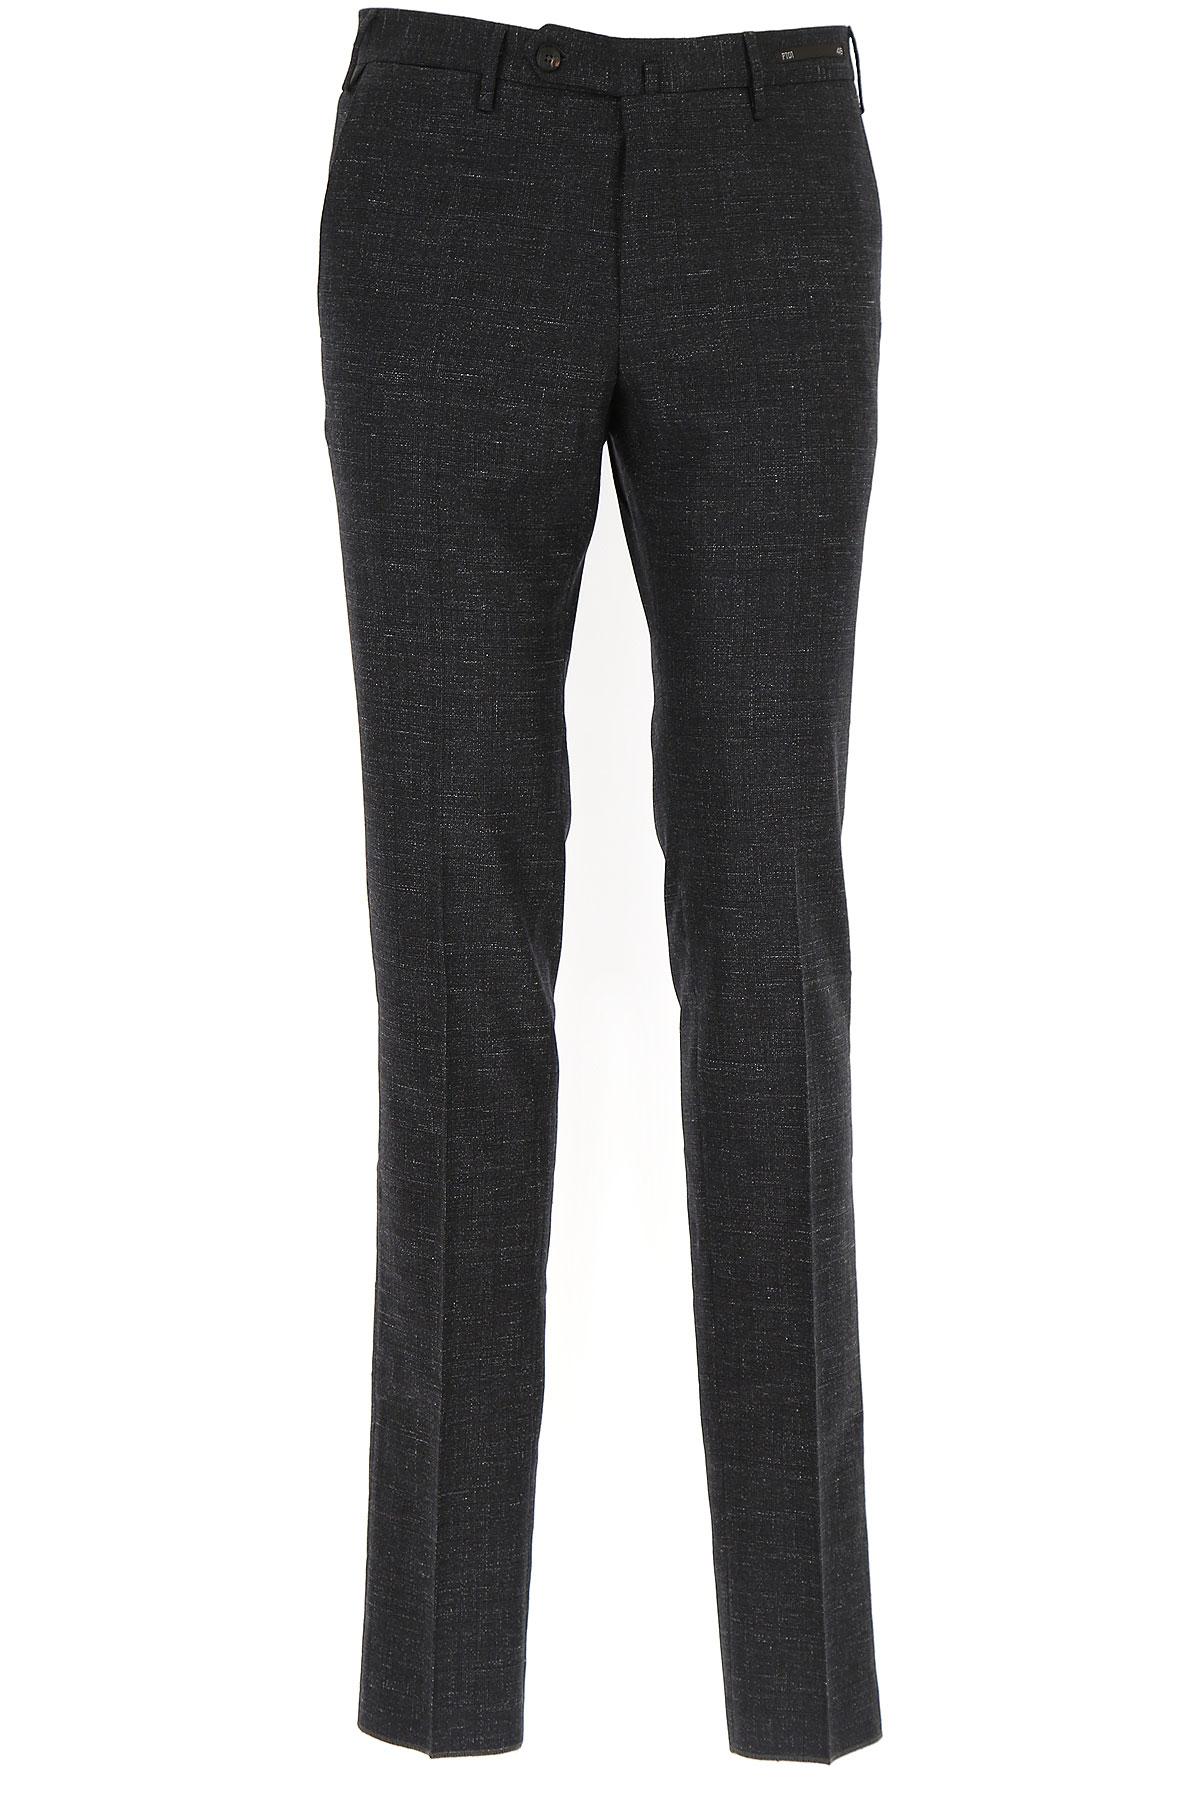 Image of PT01 Pants for Men, antracite, Virgin wool, 2017, 30 31 32 33 34